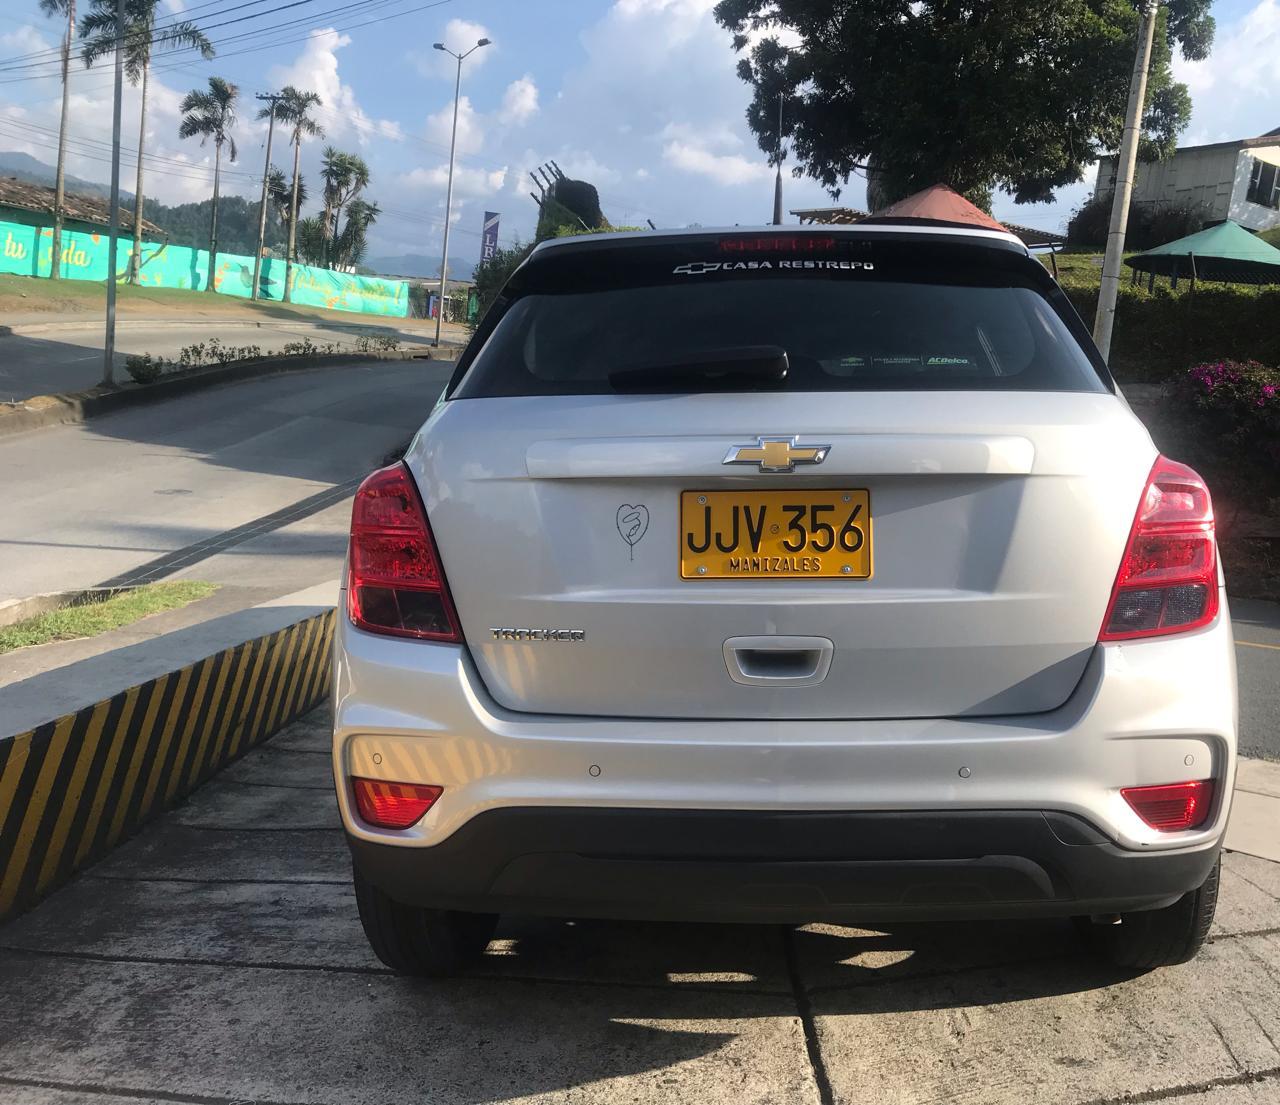 2018 CHEVROLET TRACKER PASAJEROS 1.8L